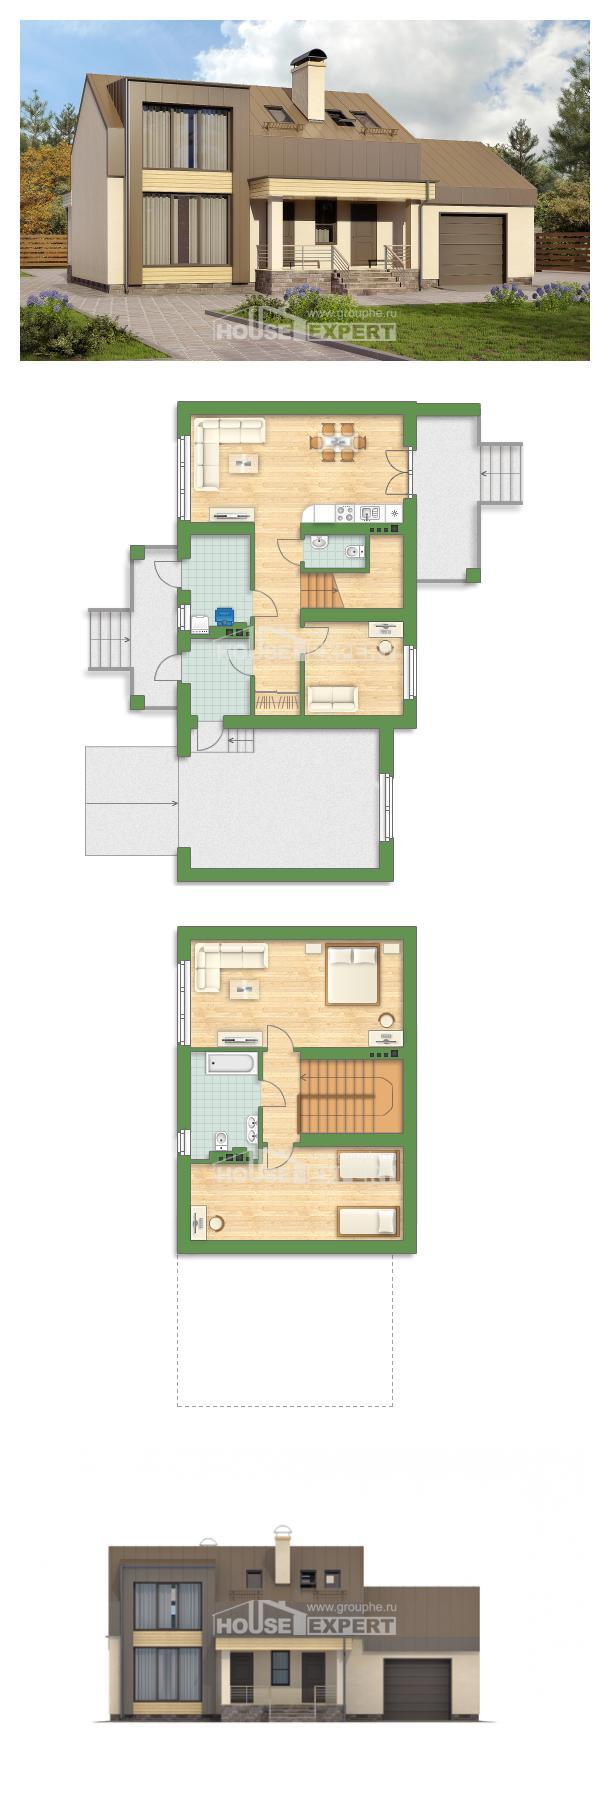 Проект дома 150-015-Л   House Expert